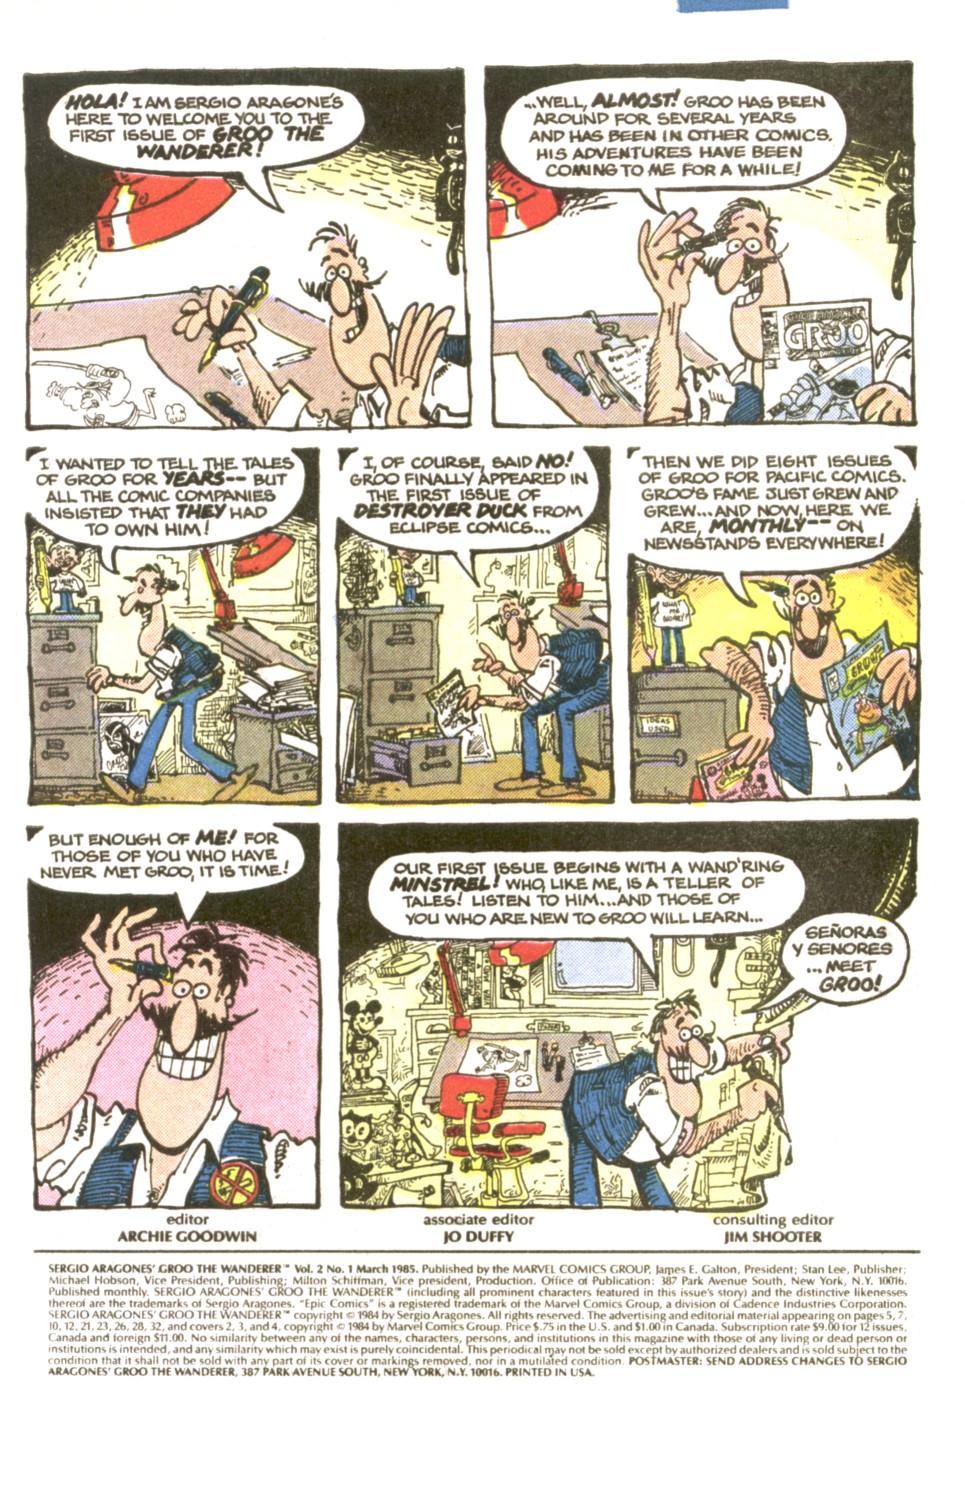 Read online Sergio Aragonés Groo the Wanderer comic -  Issue #1 - 2